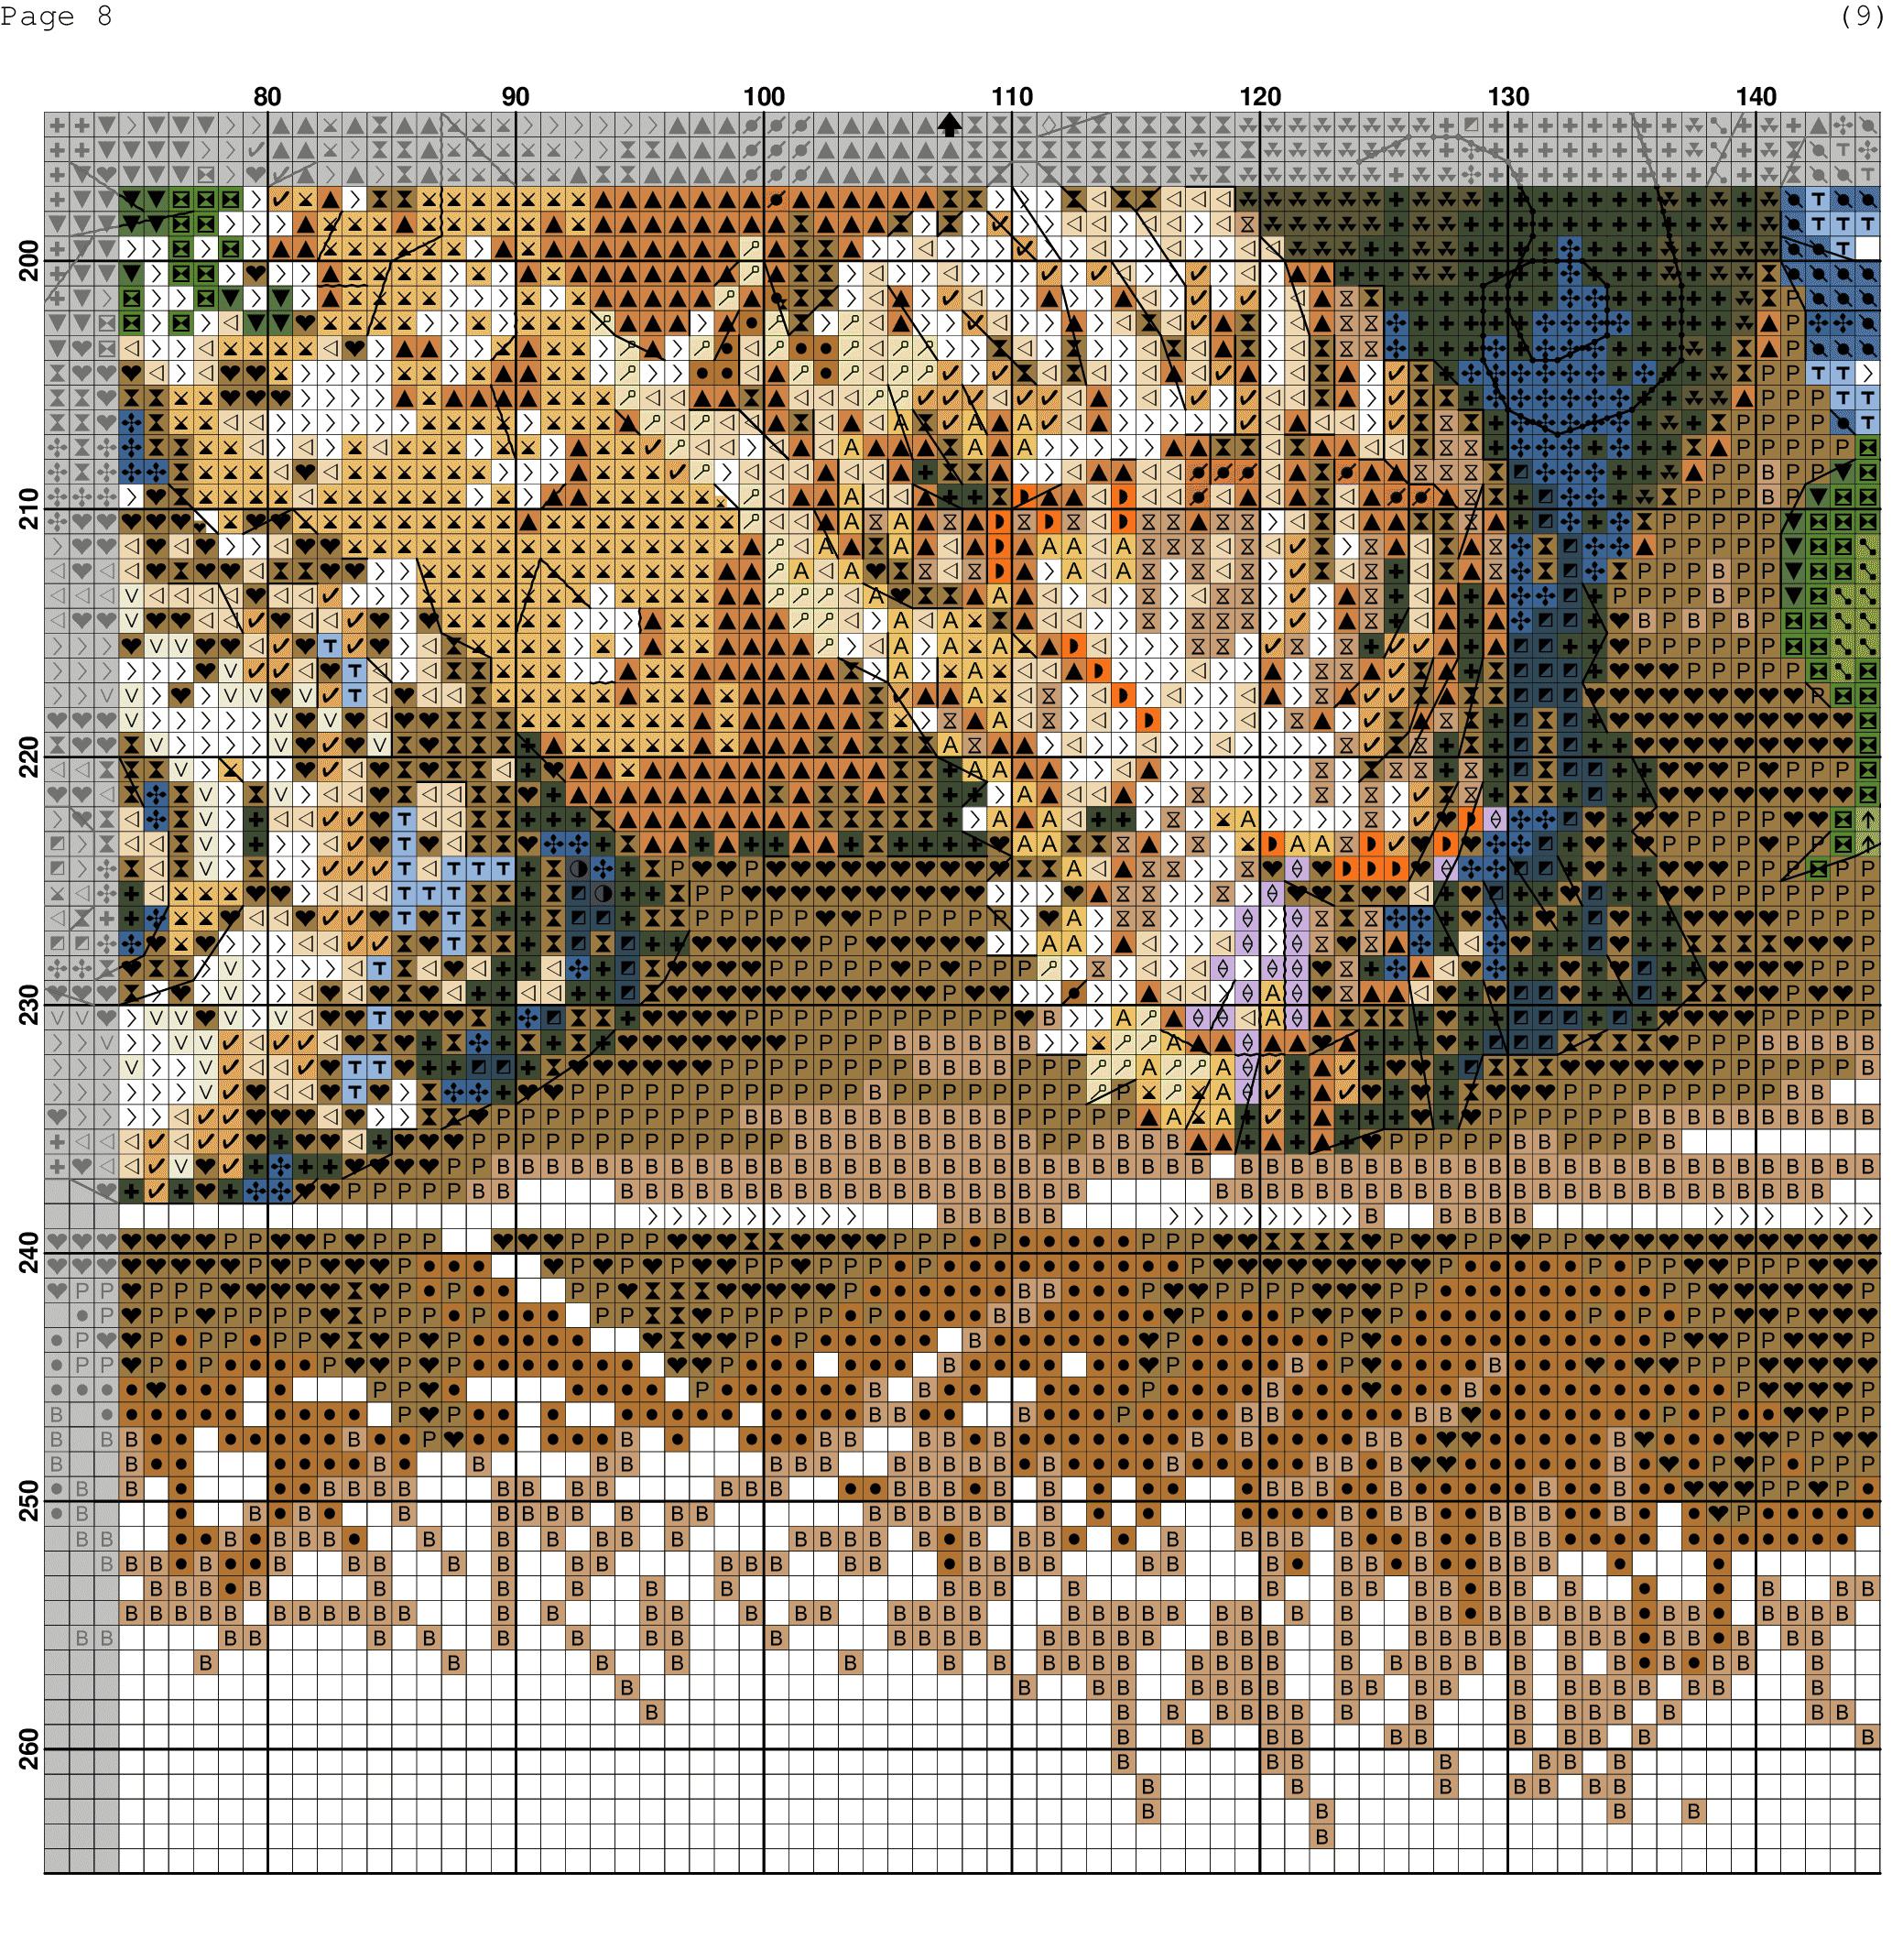 wildflowers-cross-stitch-patterns-(9)